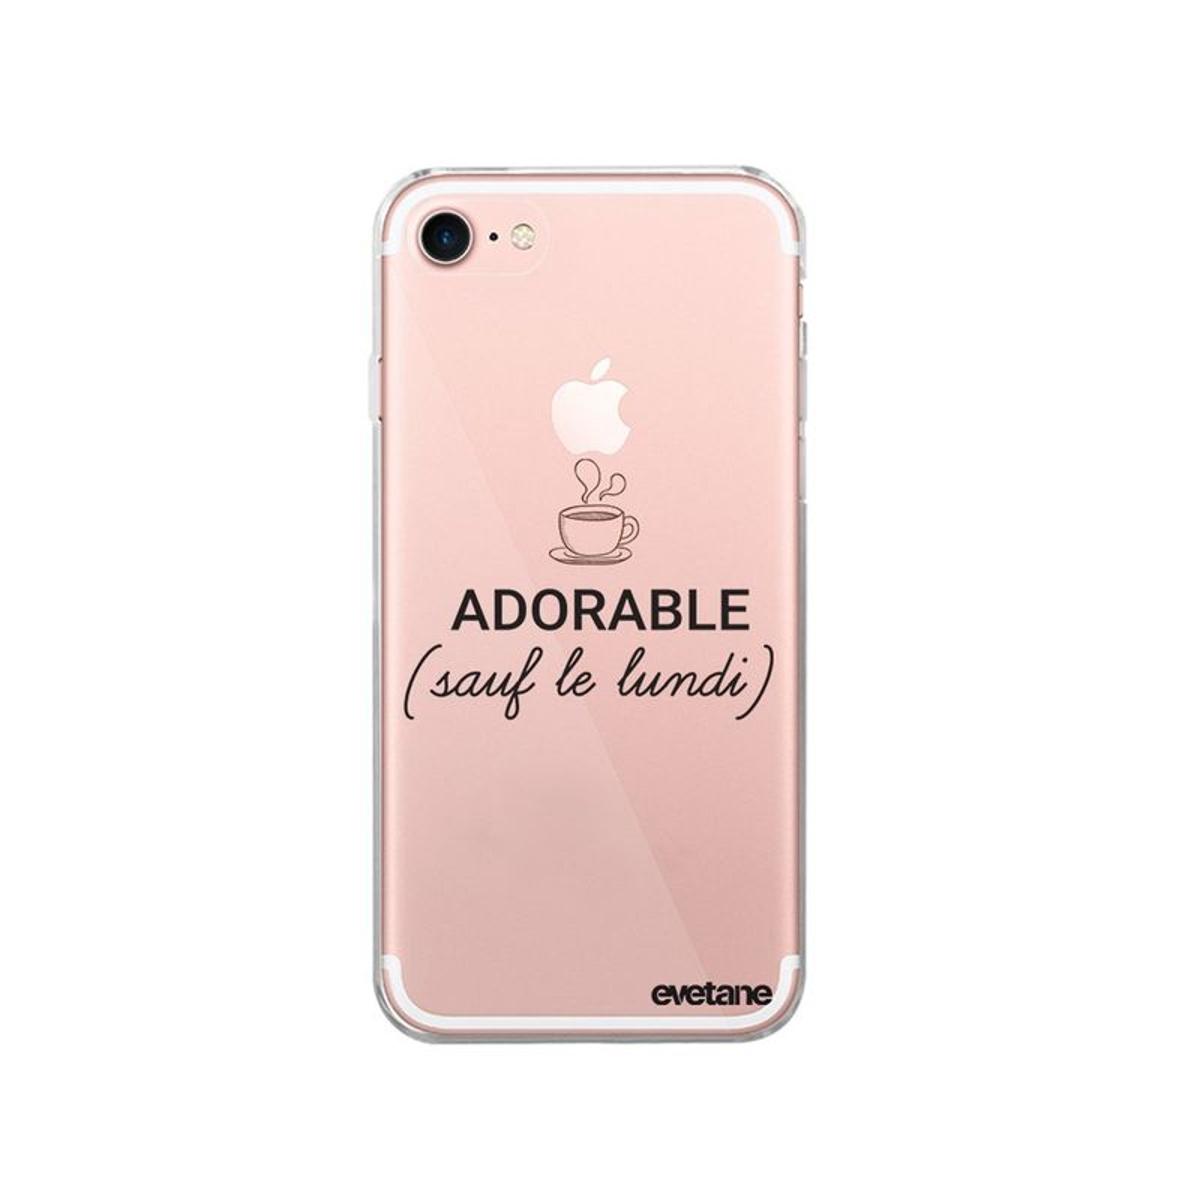 Coque iPhone 7 iPhone 8 souple transparente, Adorable Sauf le Lundi, Evetane®